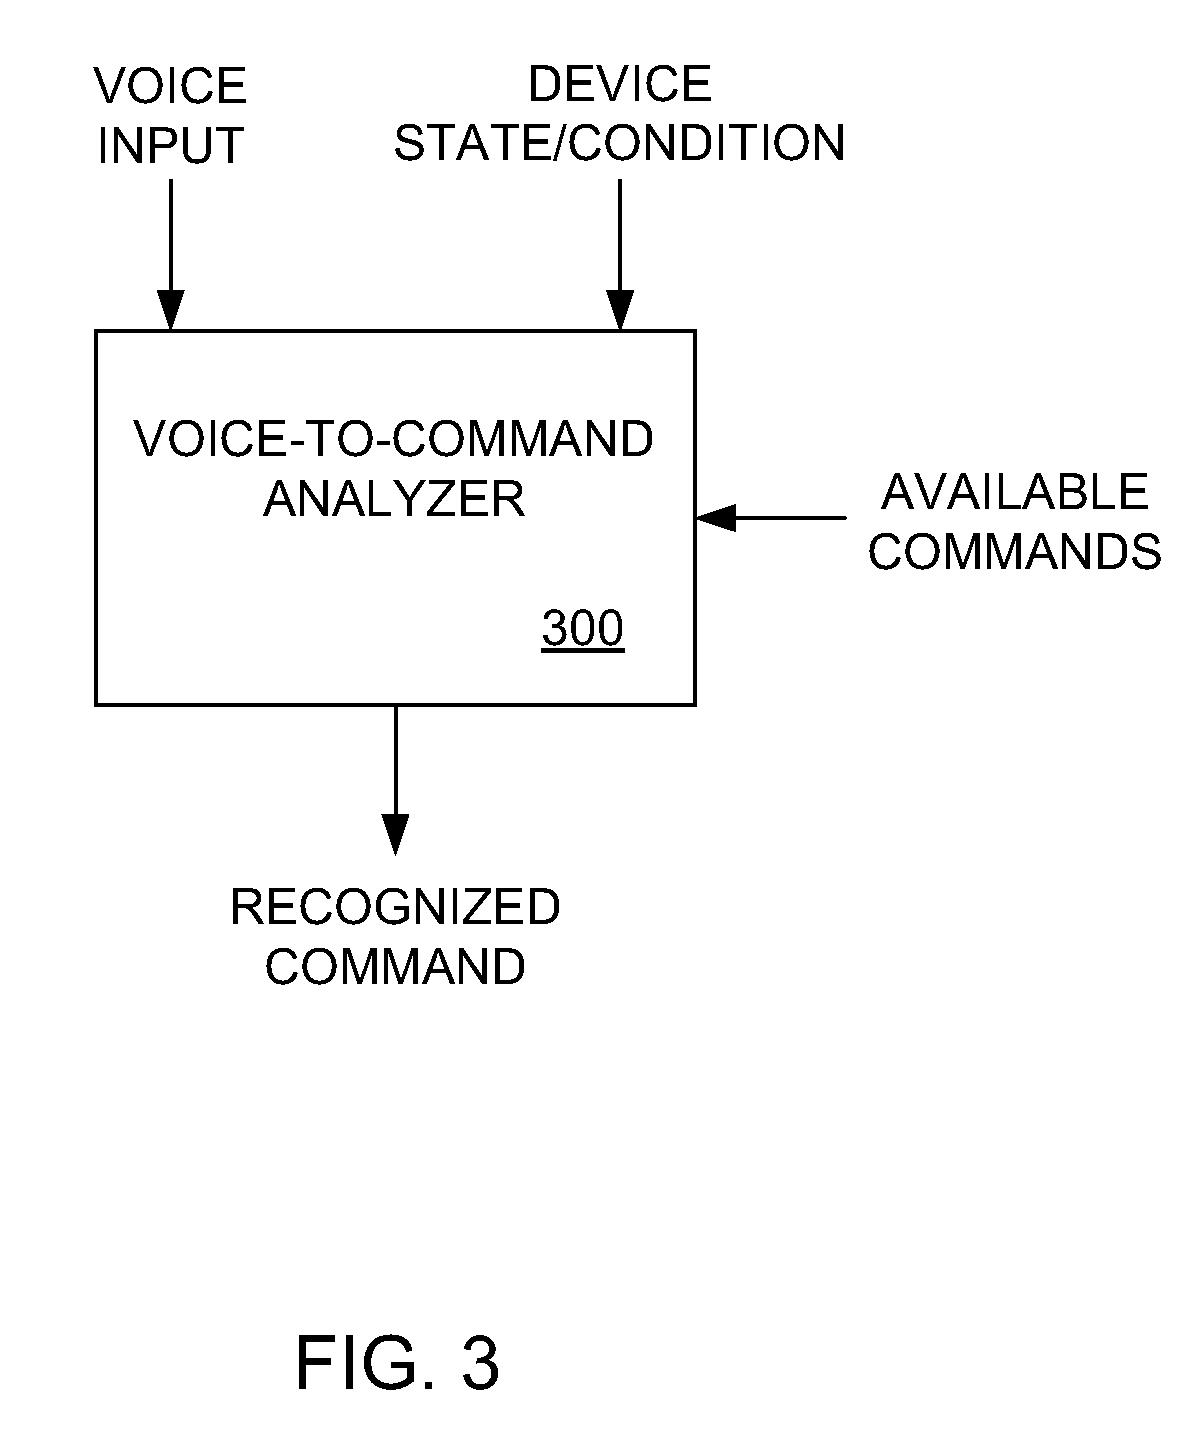 Patent US 8,977,255 B2